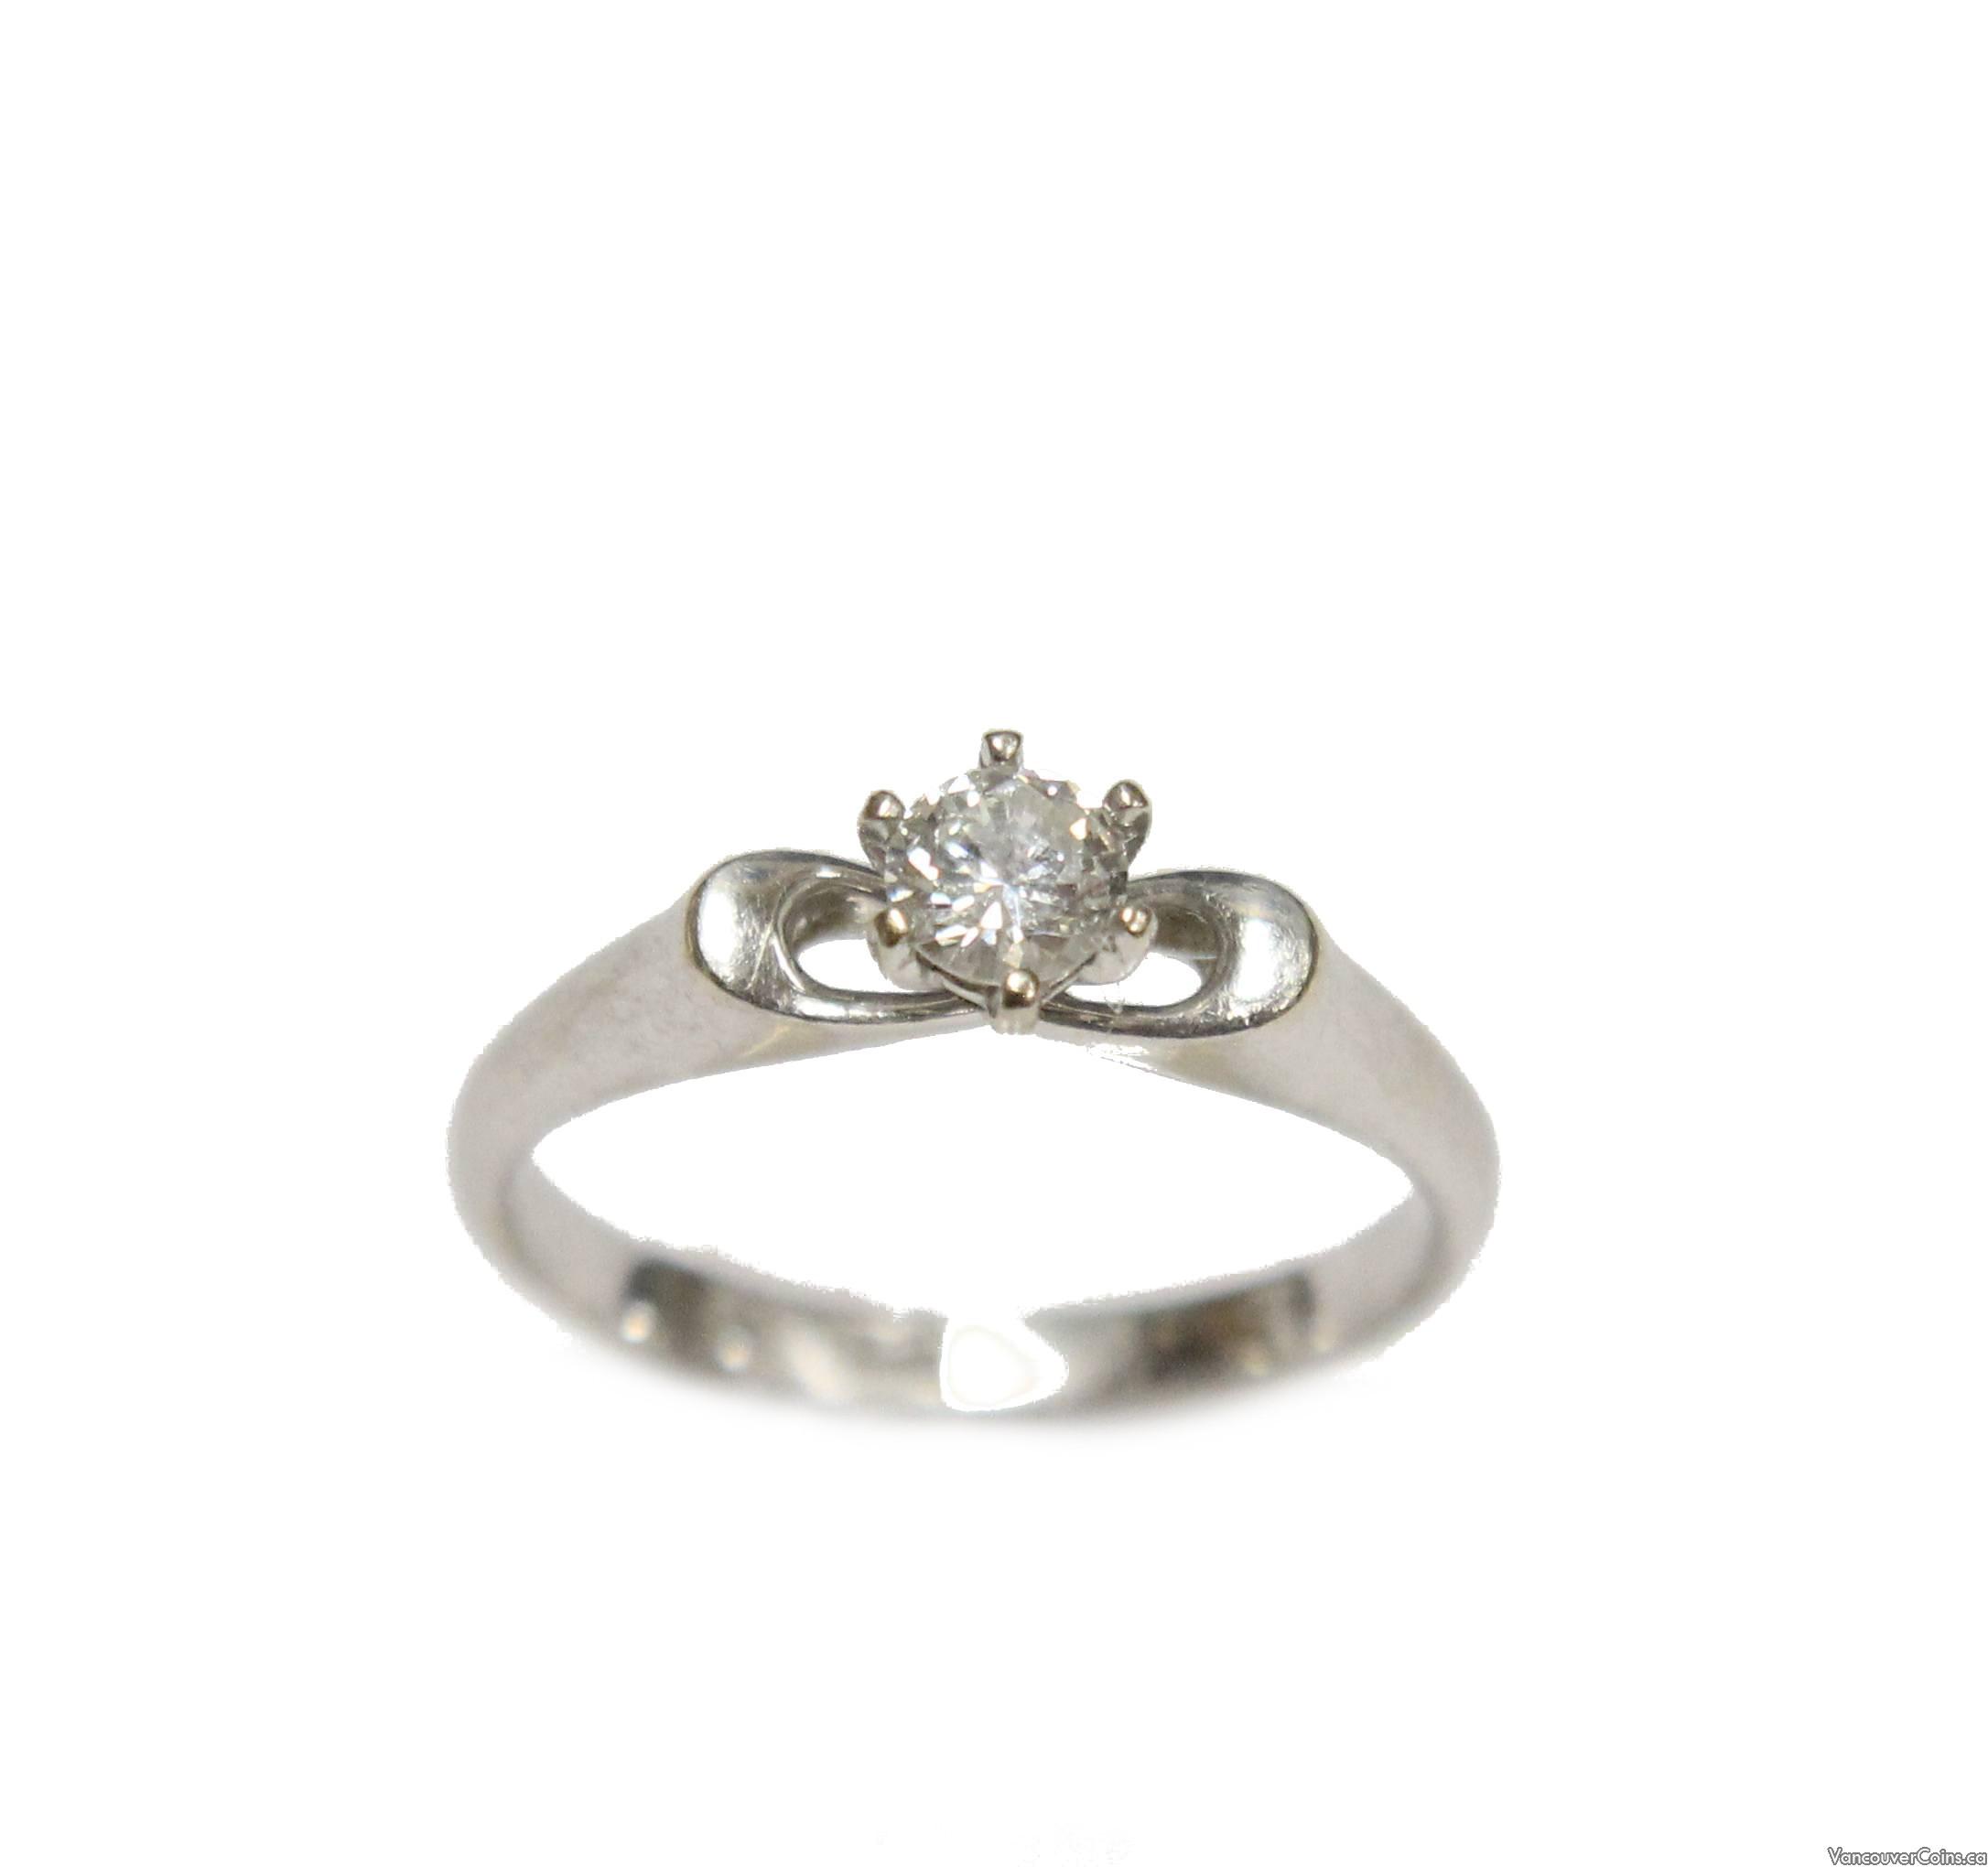 14 Karat White Gold Solitaire .28 ct Diamond Engagement Ring